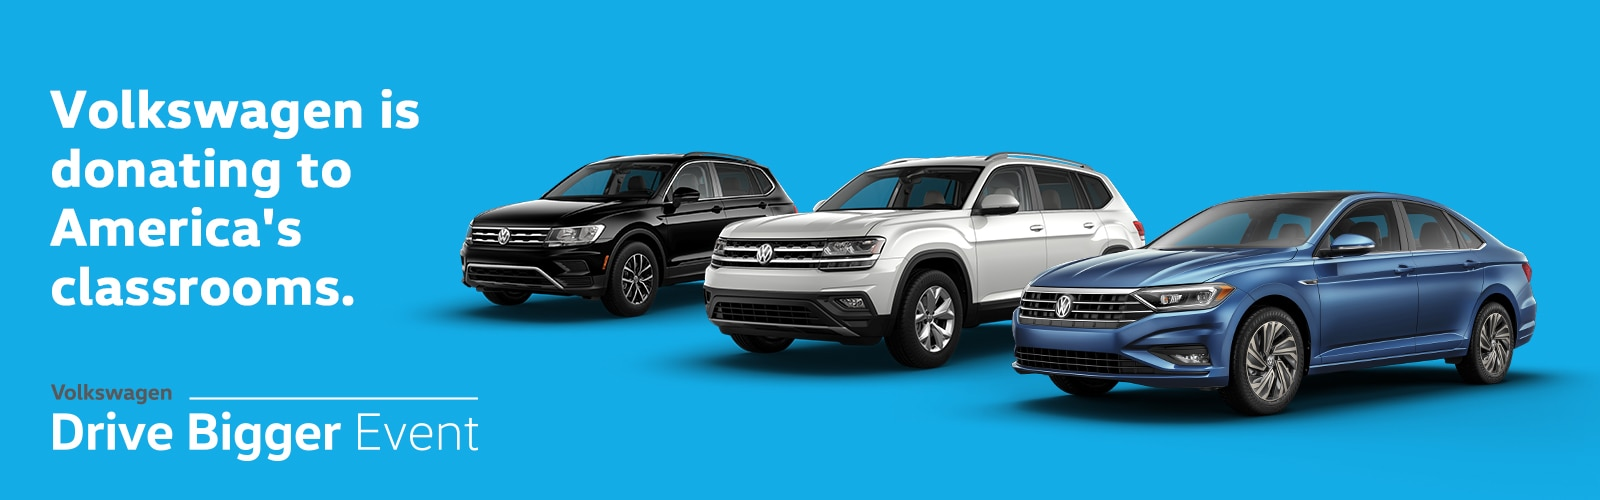 Autonation Vw Columbus Volkswagen Dealership In Columbus Ga